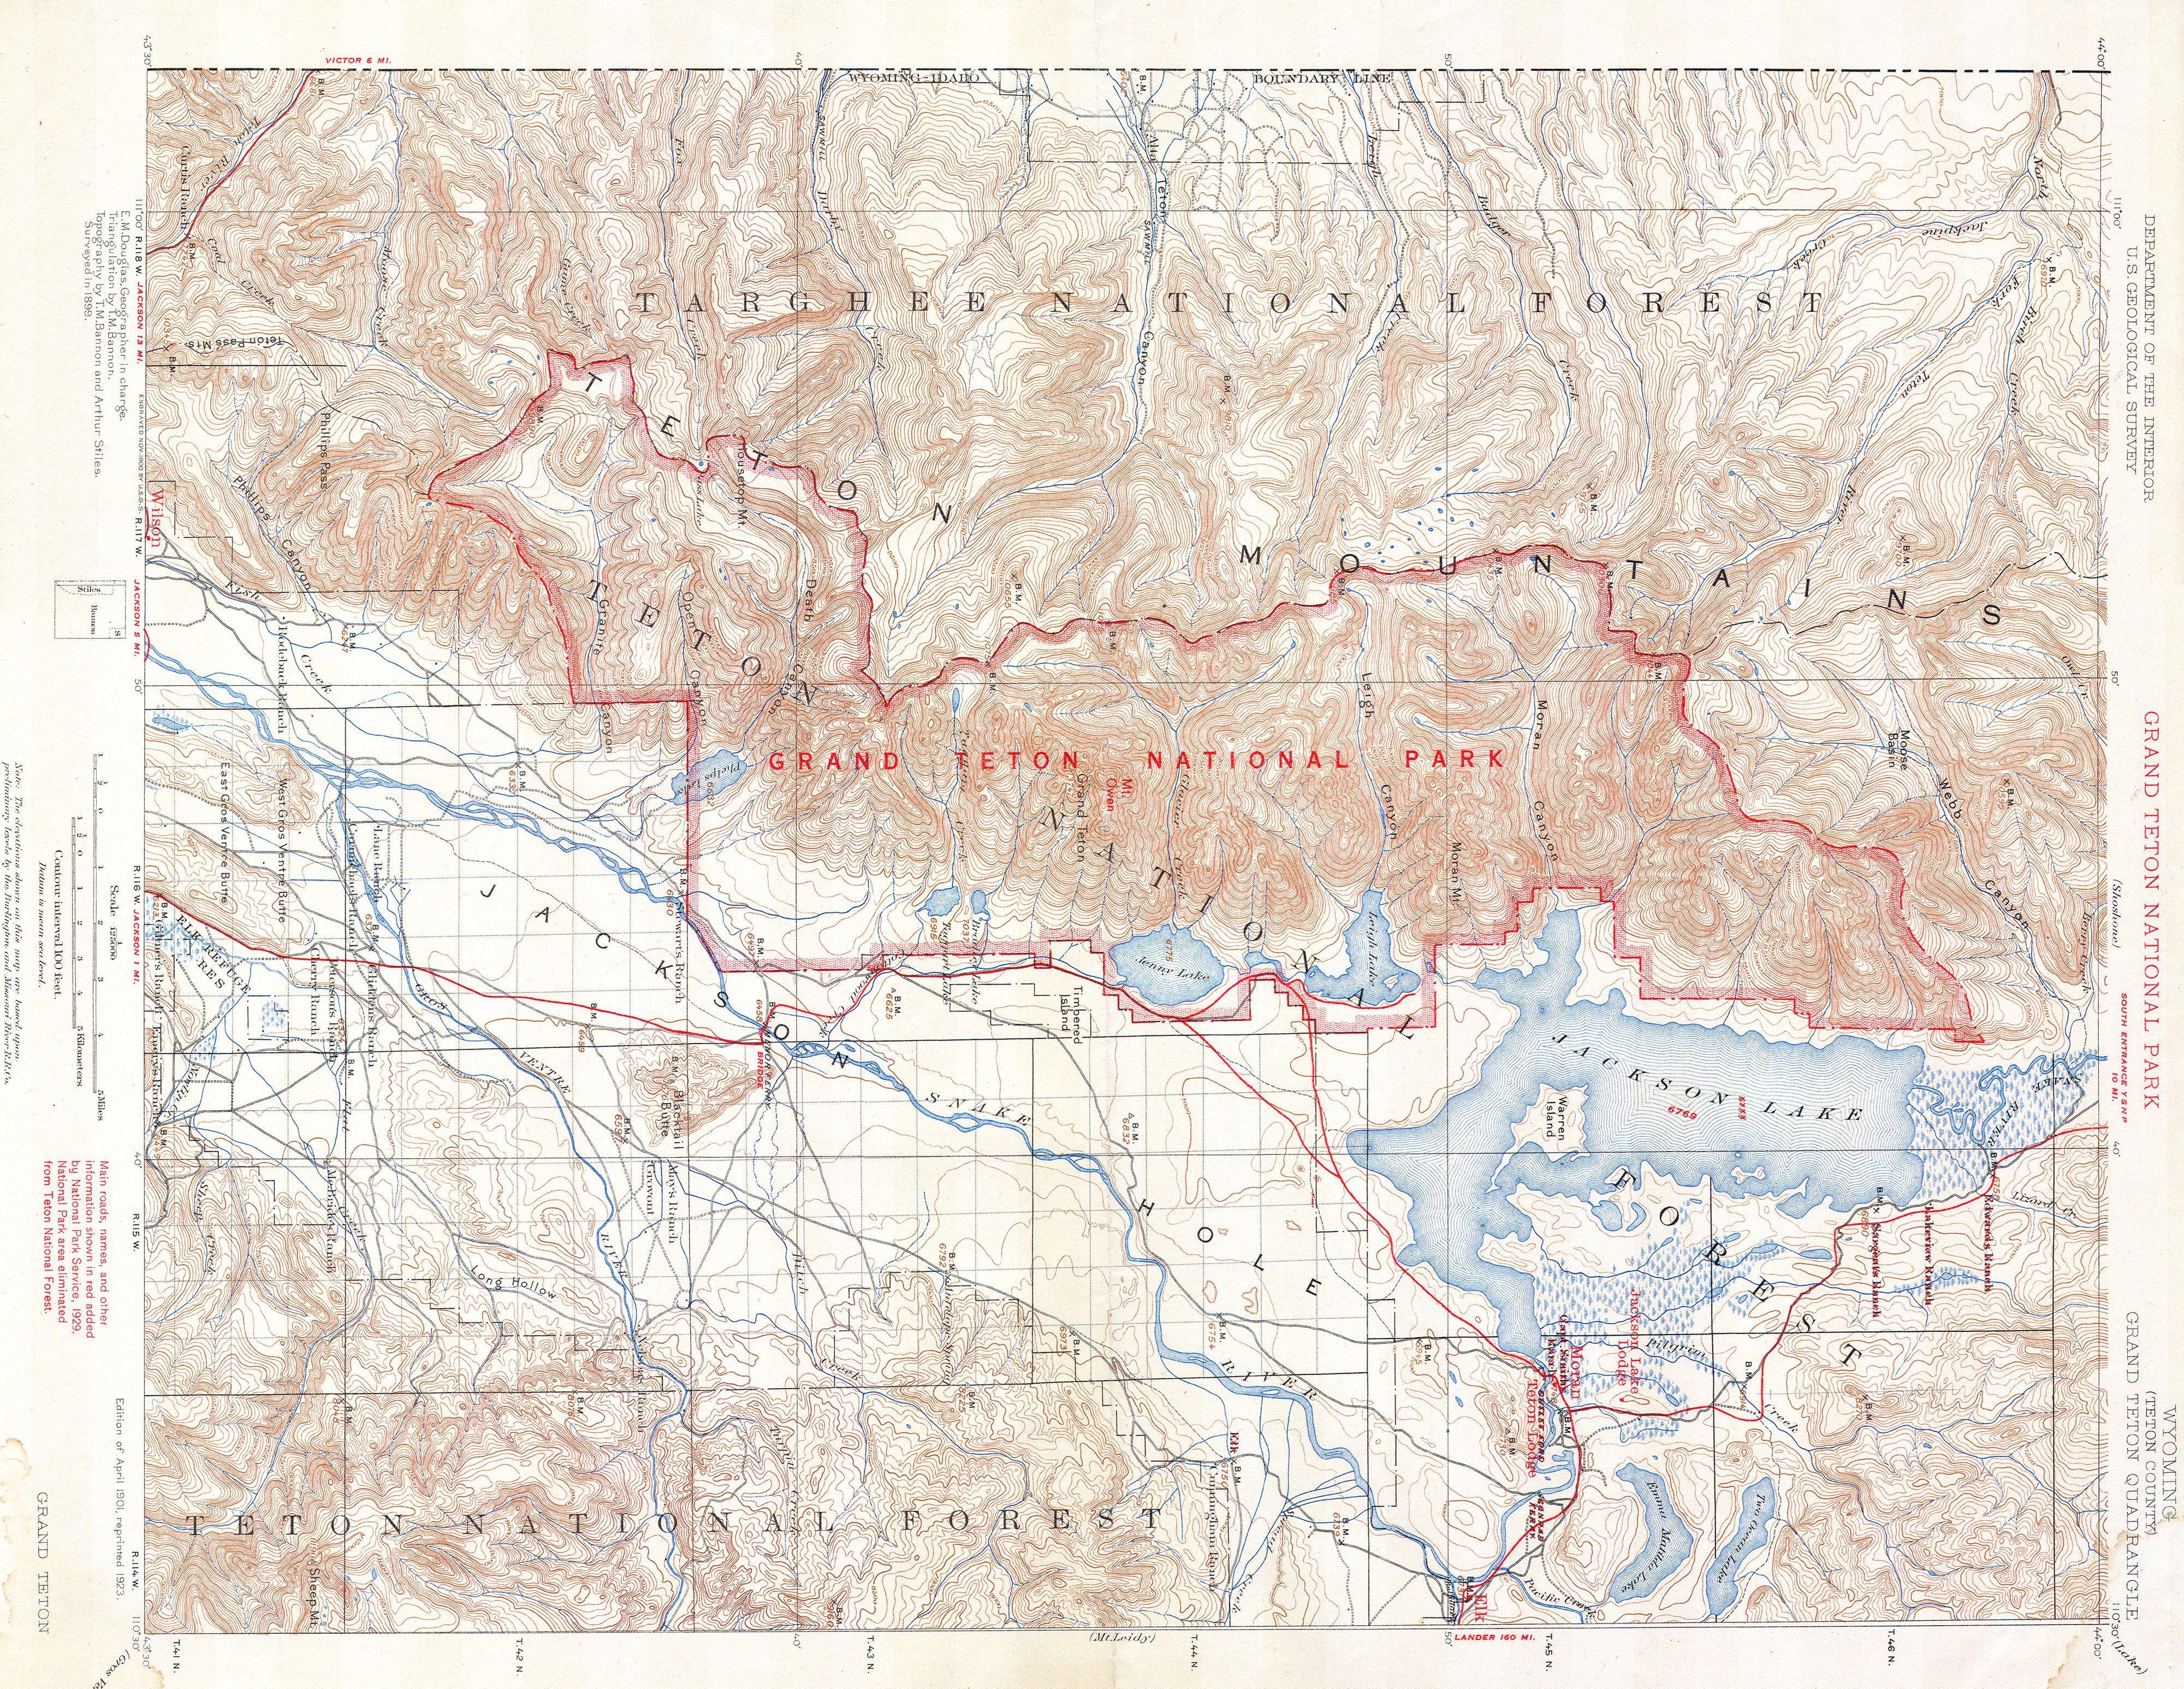 file usgs map of grand teton national park wyoming  geographicus grandteton. file usgs map of grand teton national park wyoming